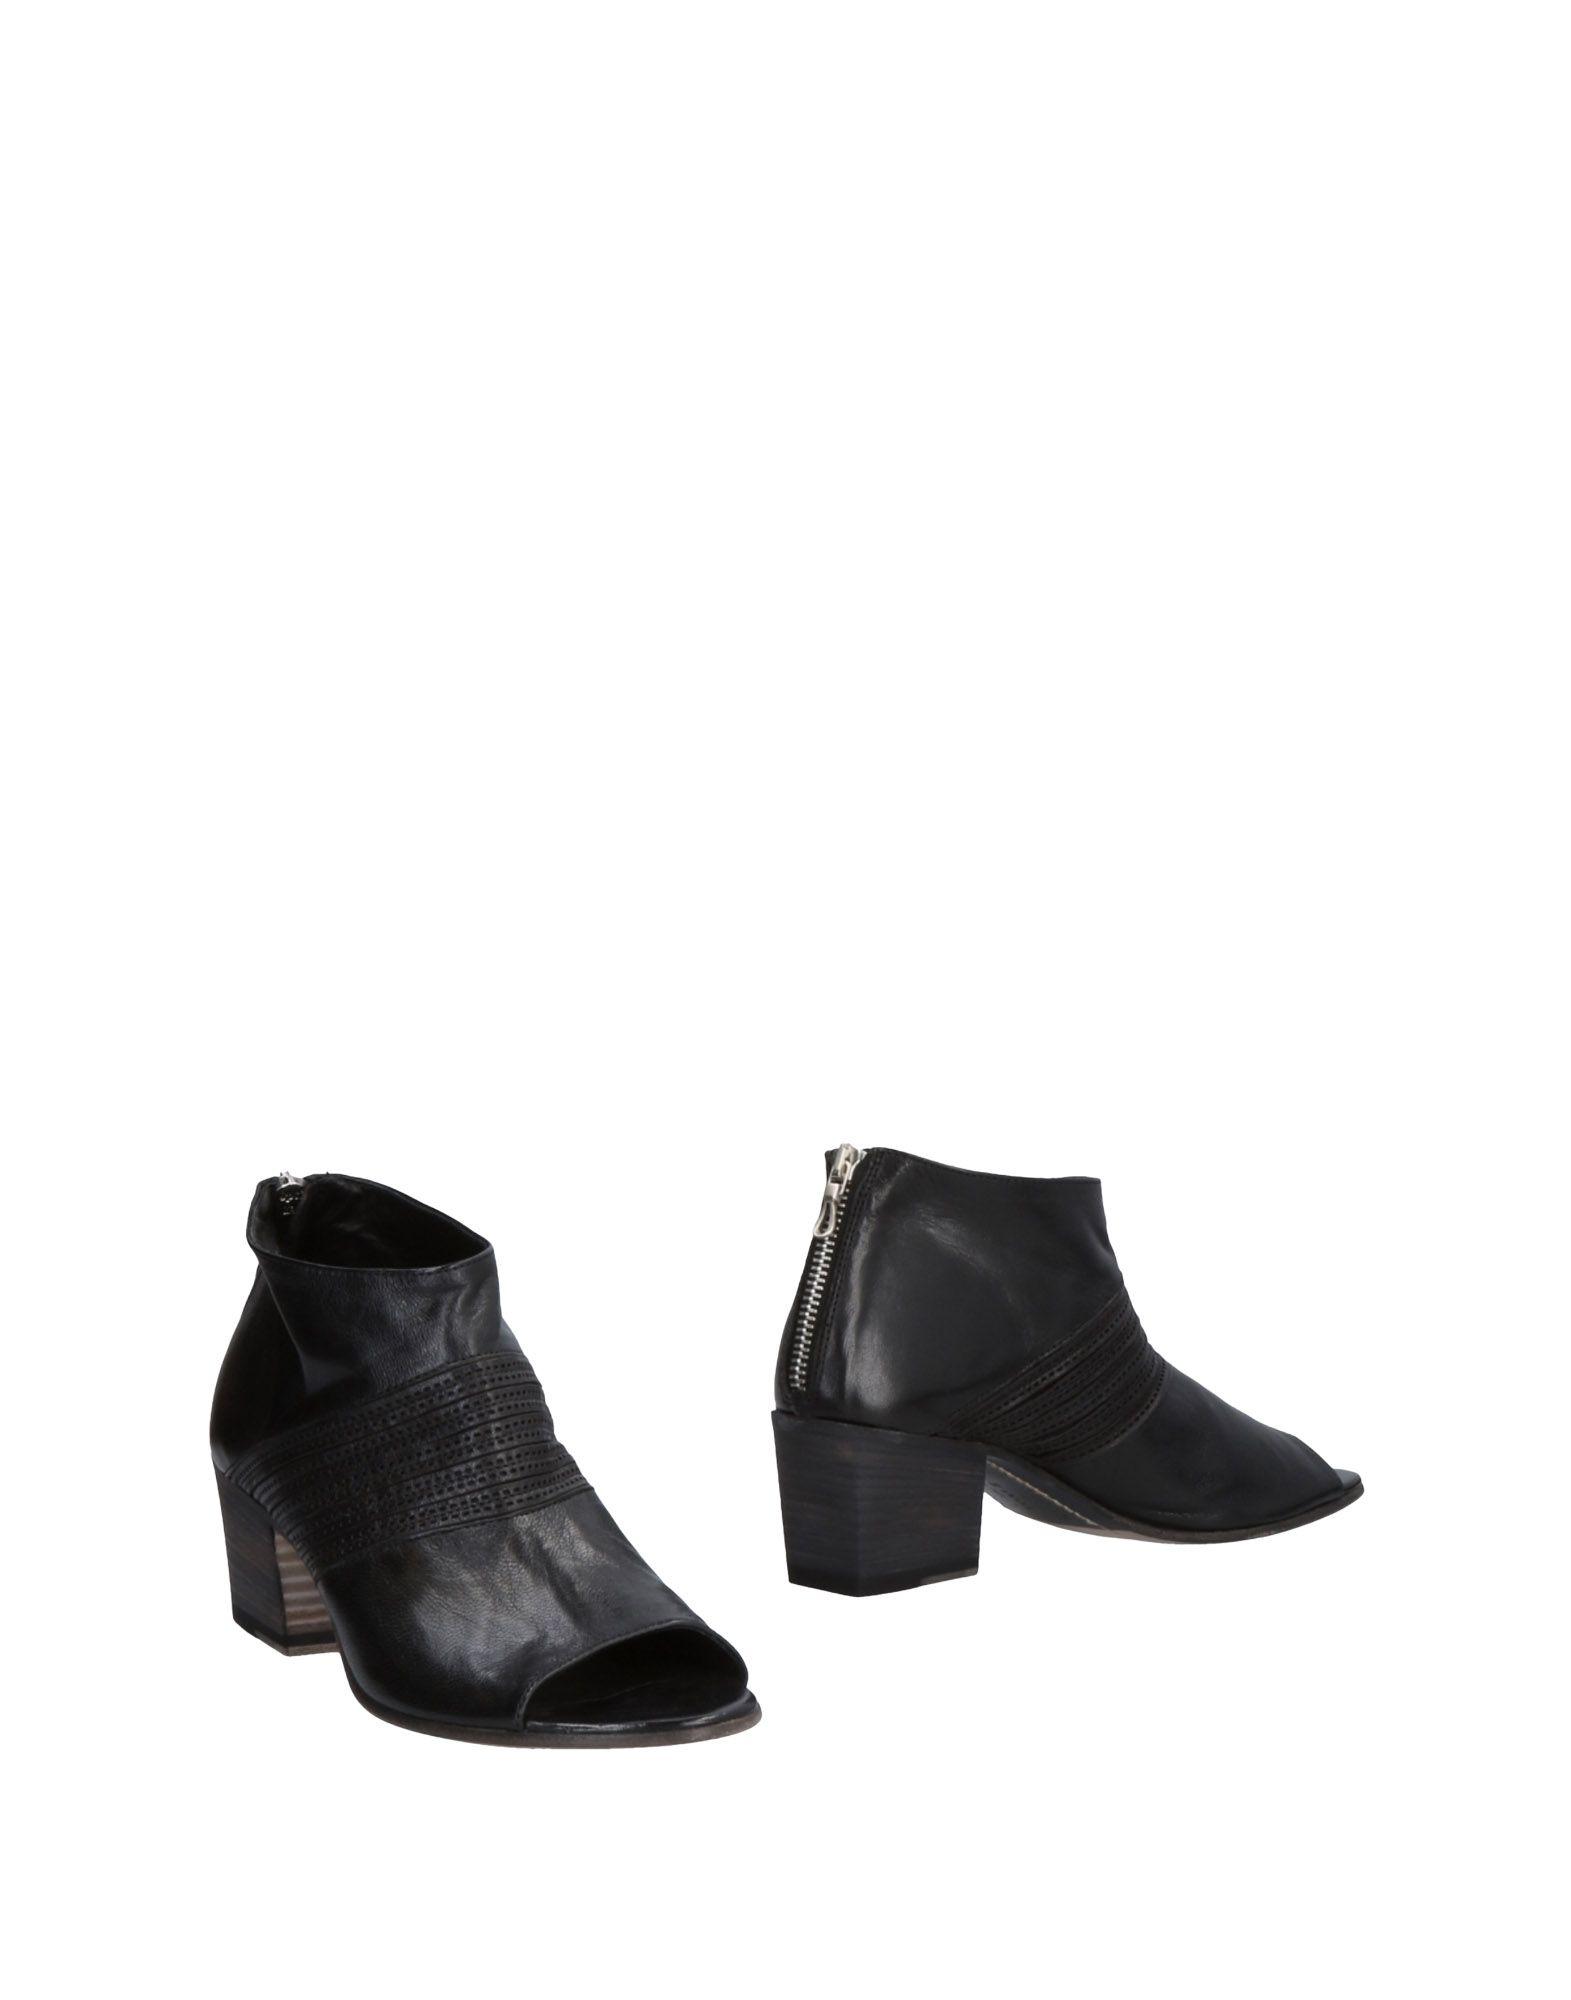 i.n.k. i.n.k. i.n.k. chaussures chaussures bottines - femmes i.n.k. bottines en ligne le royaume - uni - 11468478rk f37d1e